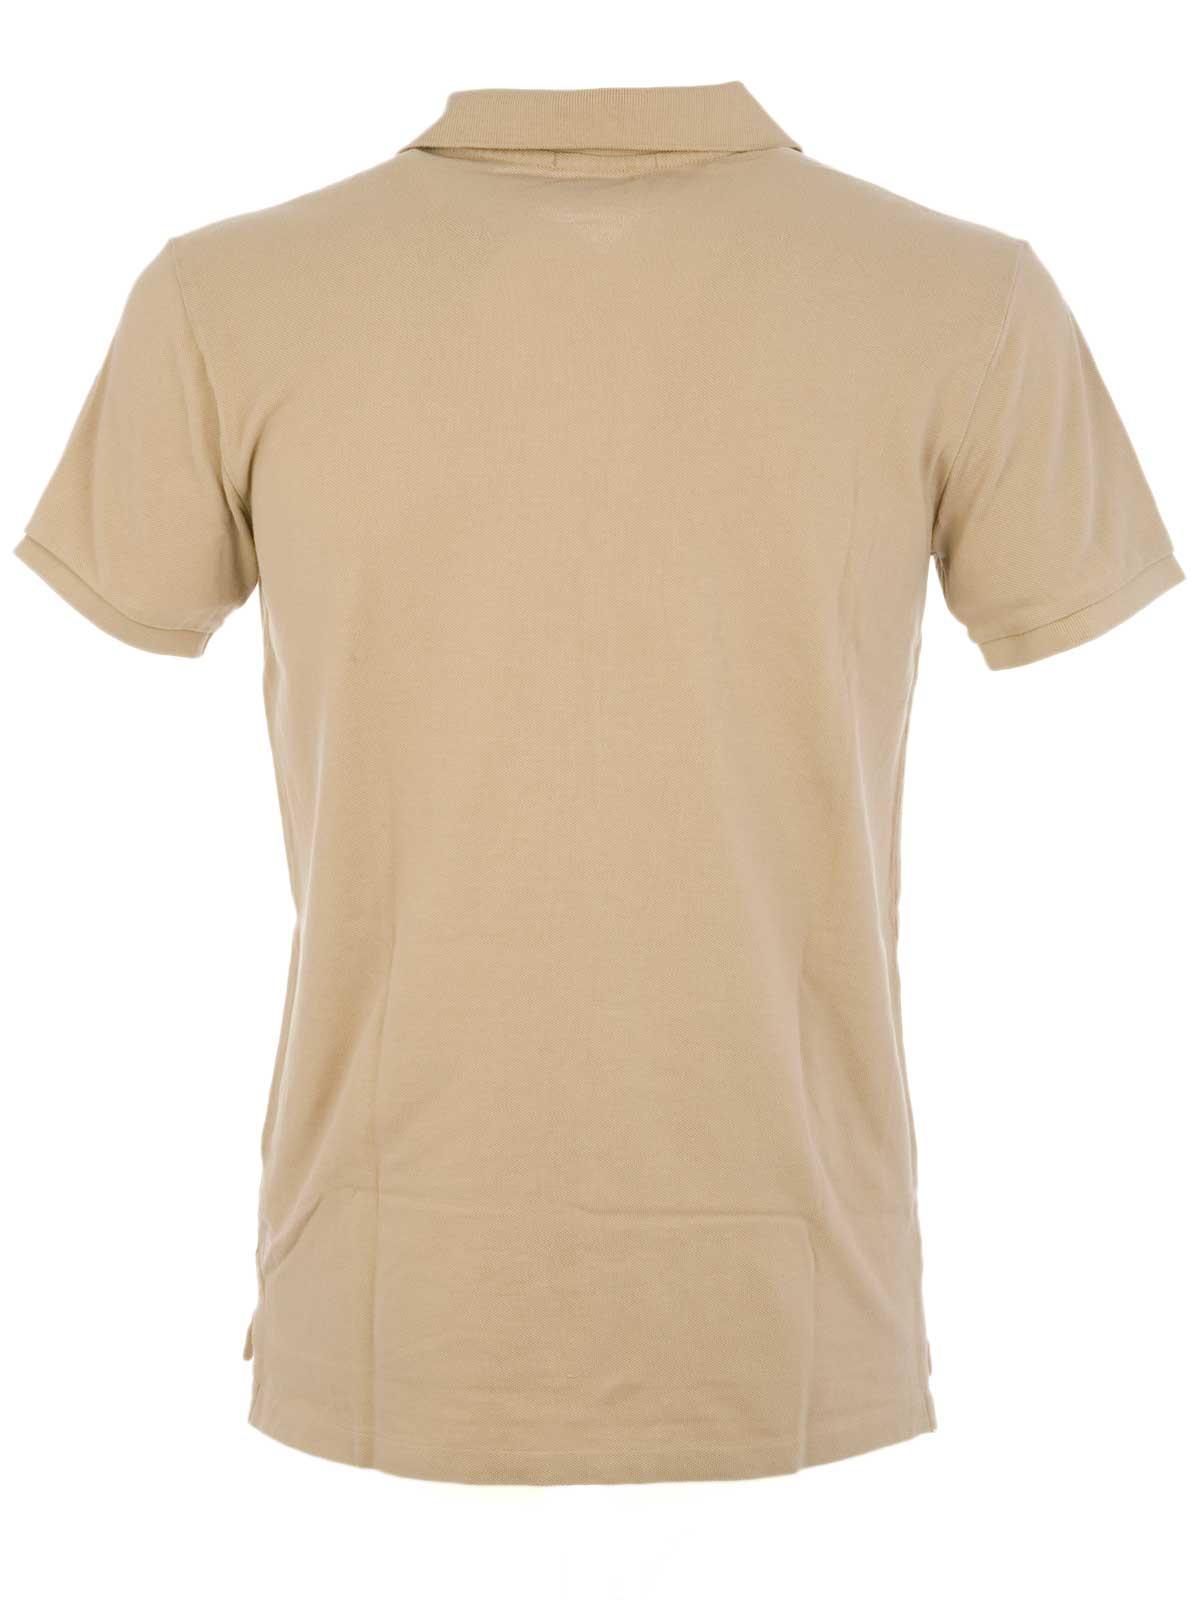 Polo ralph lauren custom fit polo shirt xw7lq for Polo ralph lauren custom fit polo shirt